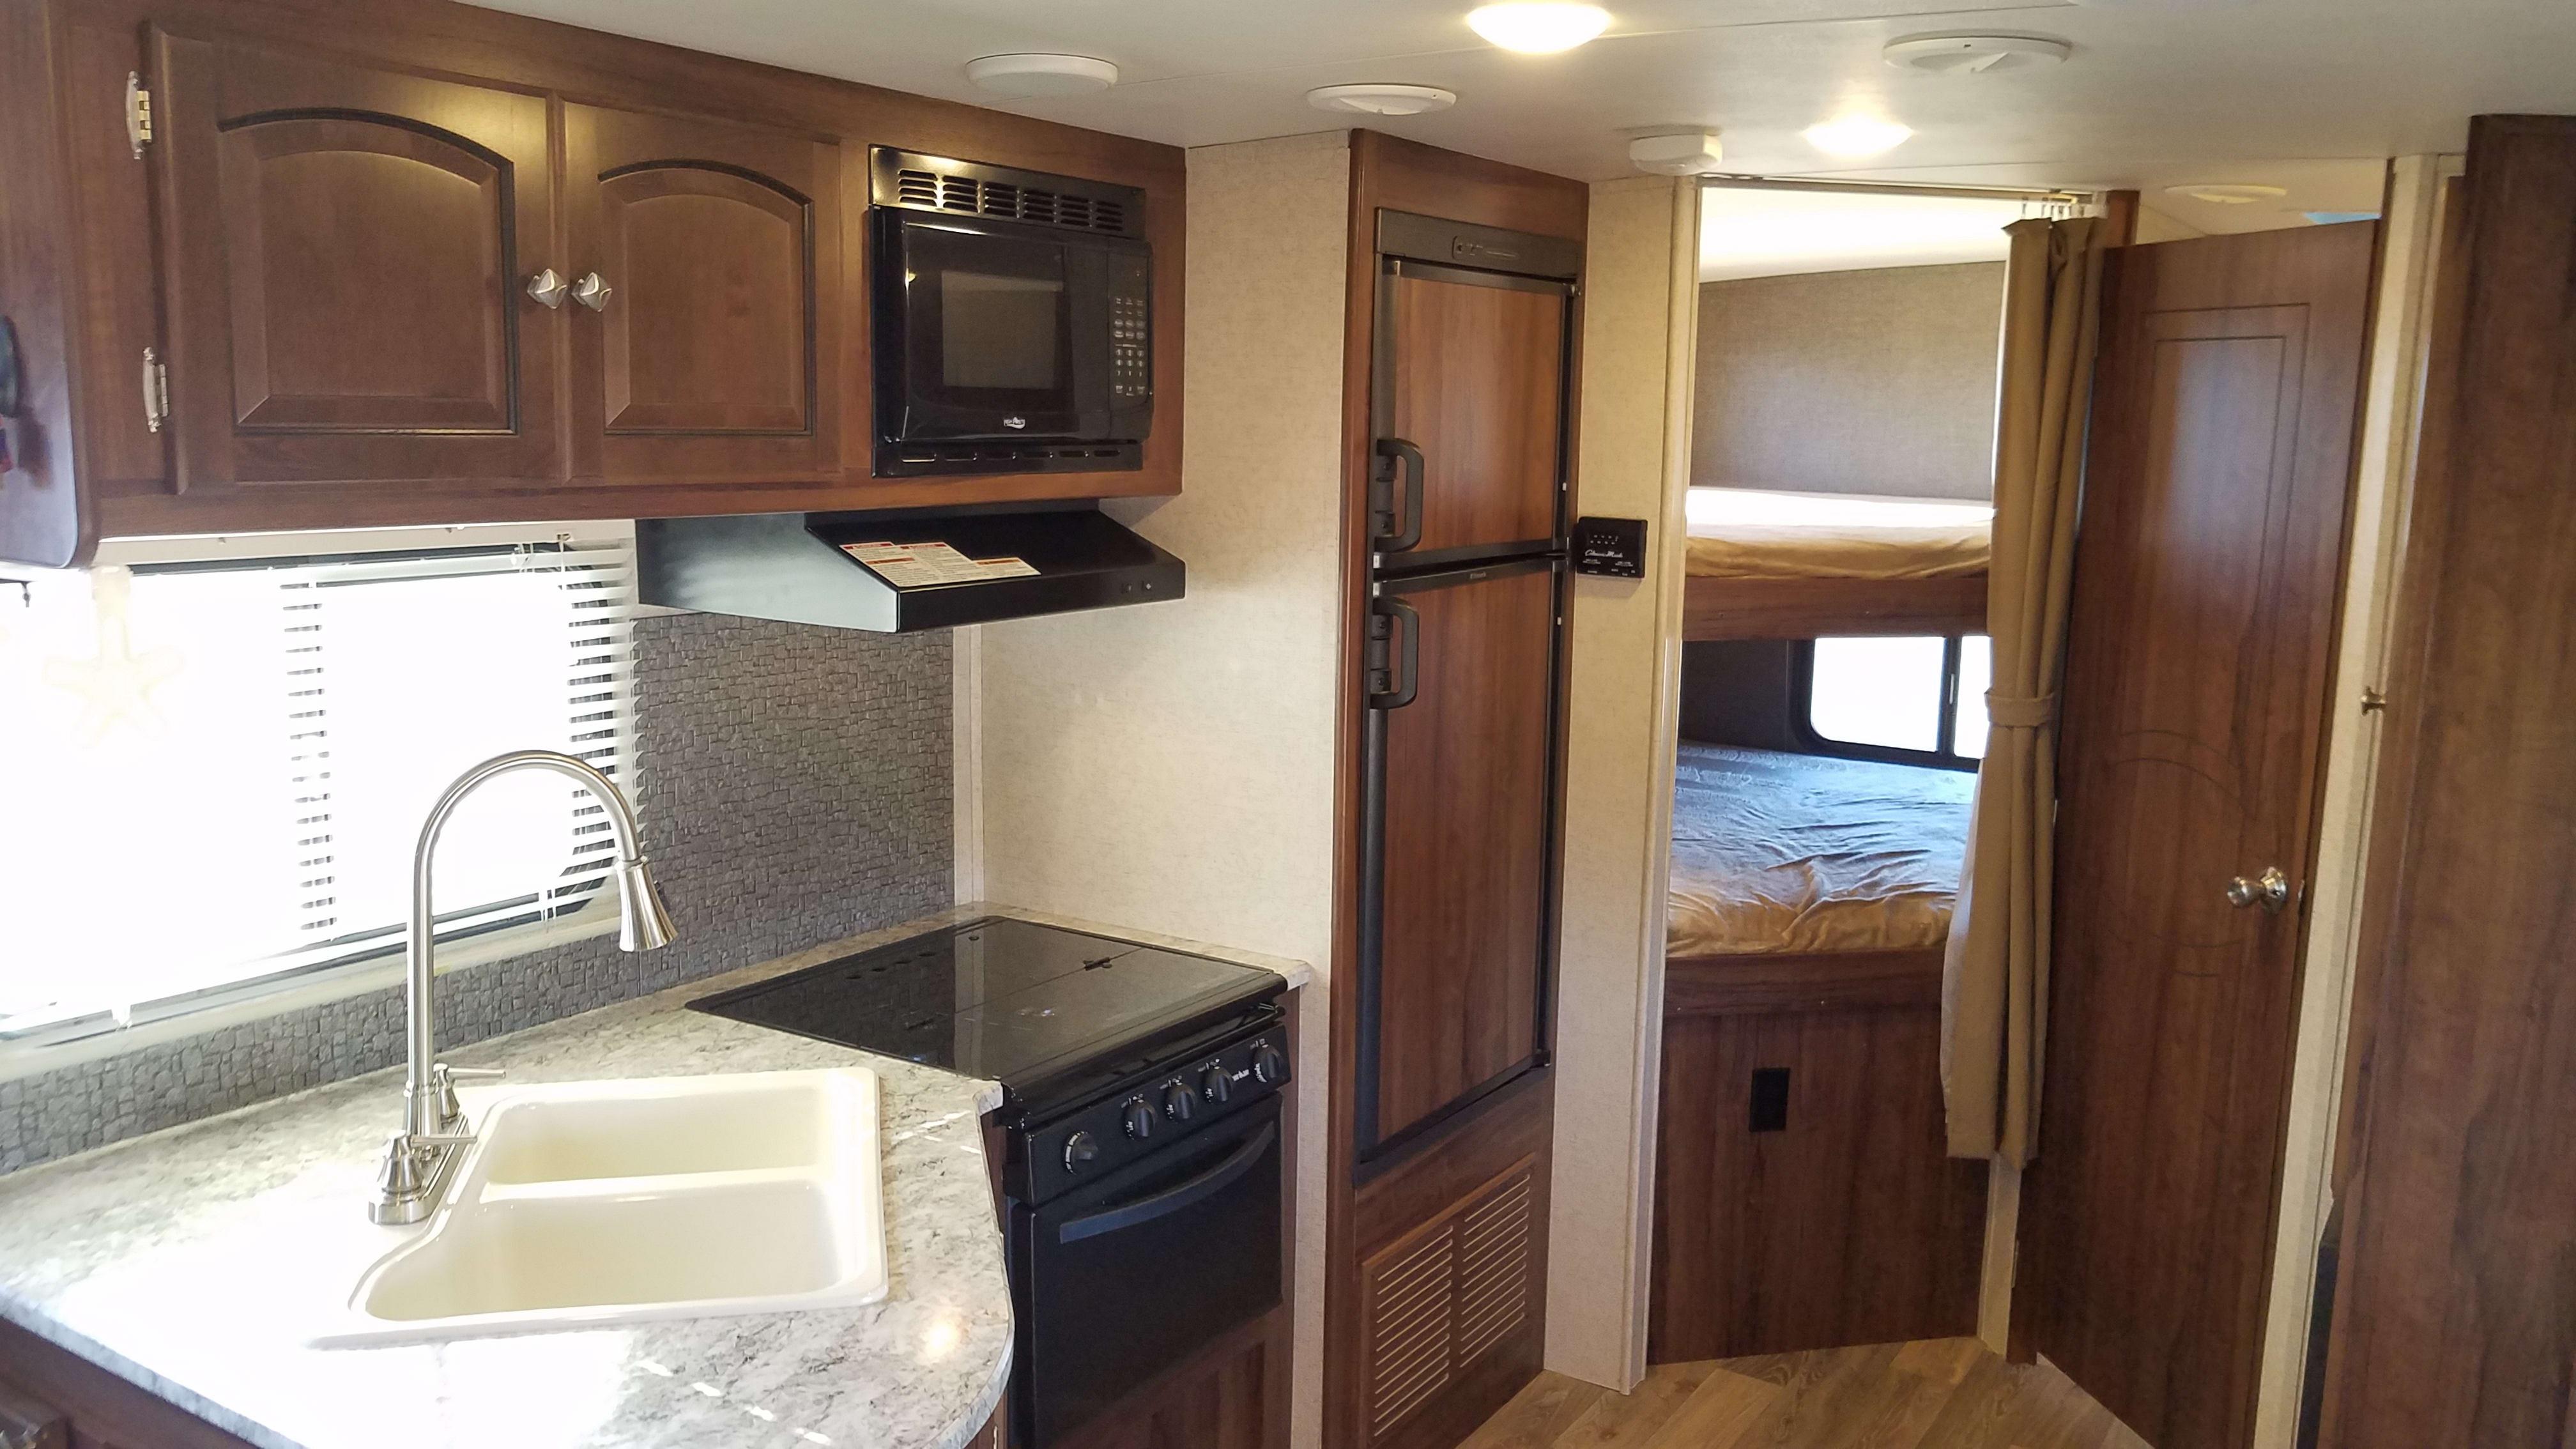 Kitchen and Bunks. Heartland Northtrail 2016